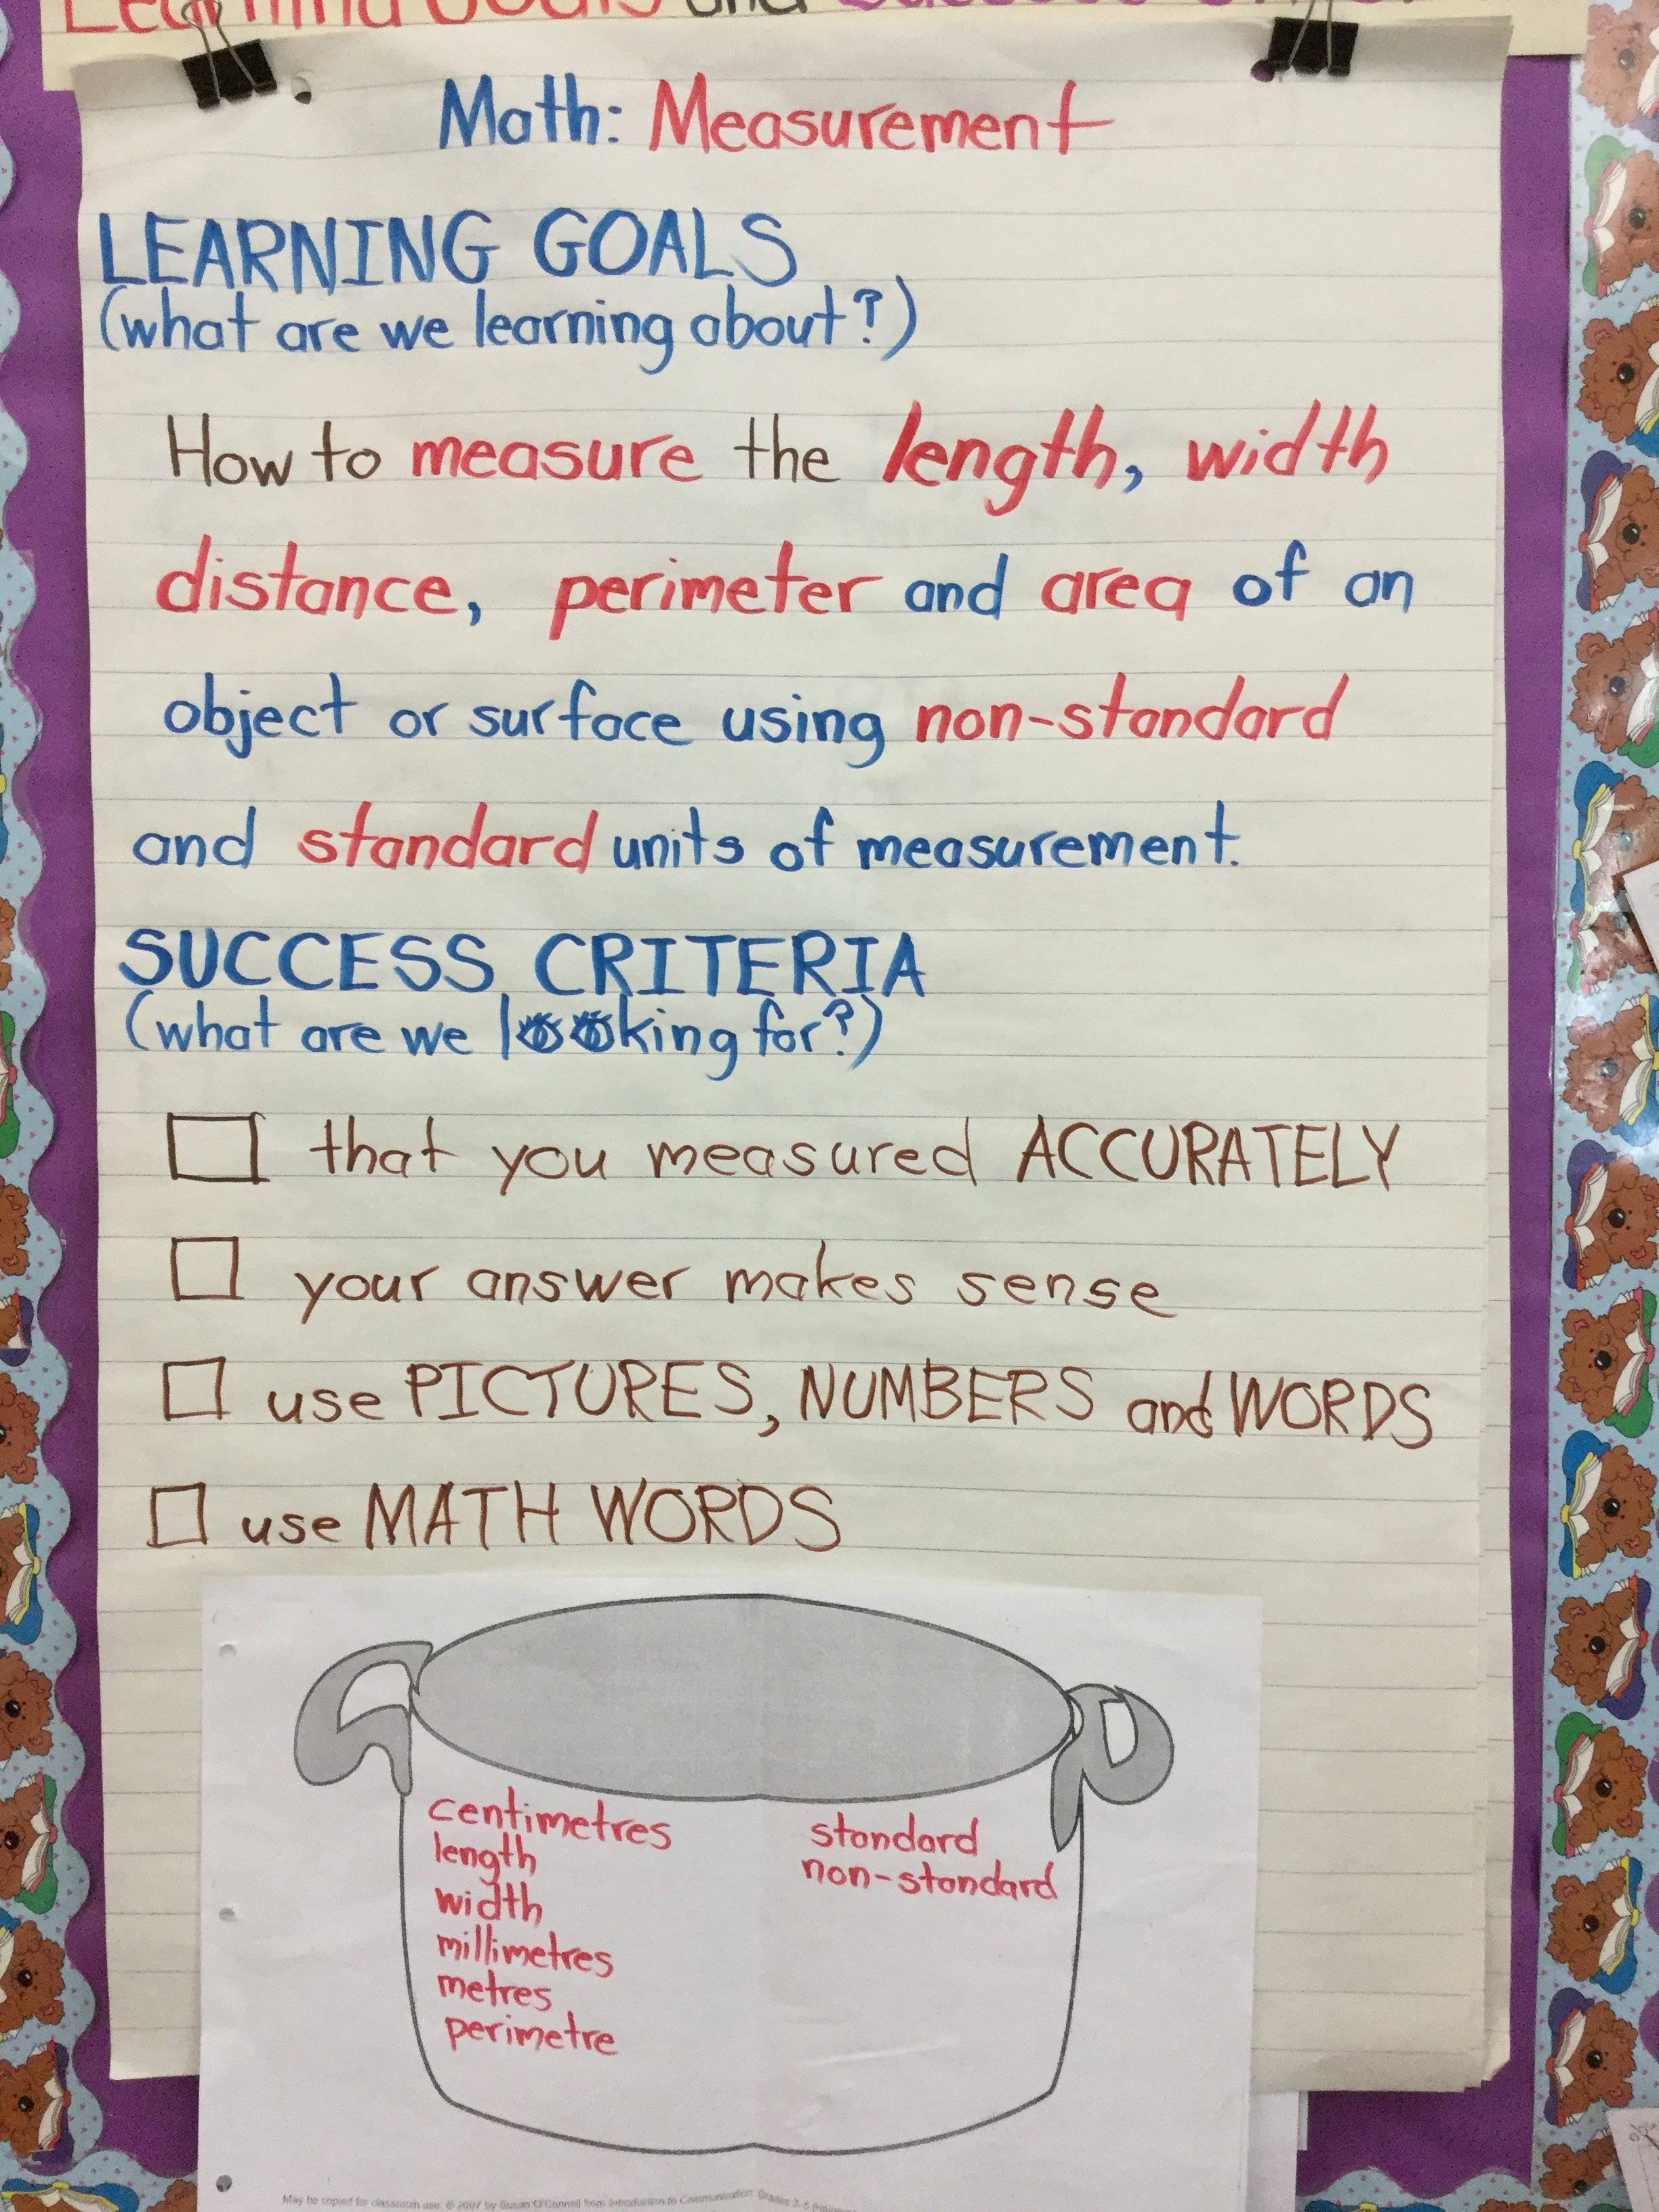 Learning Goals Amp Success Criteria Math Measurement